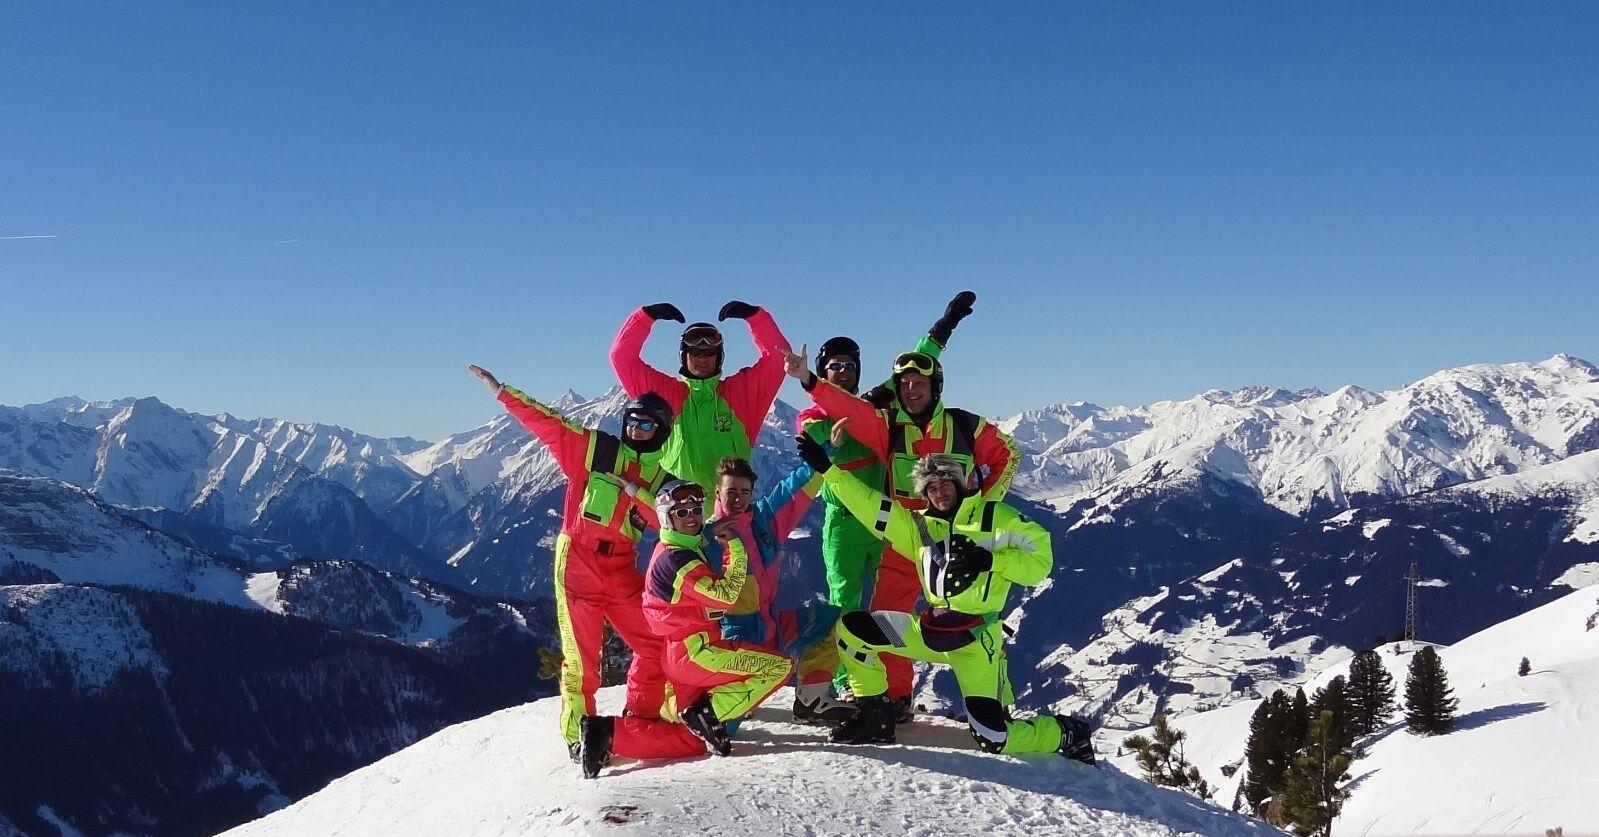 Retro Vintage 80's 90's Ski Suit Suit Ski STAG Neon Apres Ski O'NEILL FORD SKY REPORT 9a9b3c